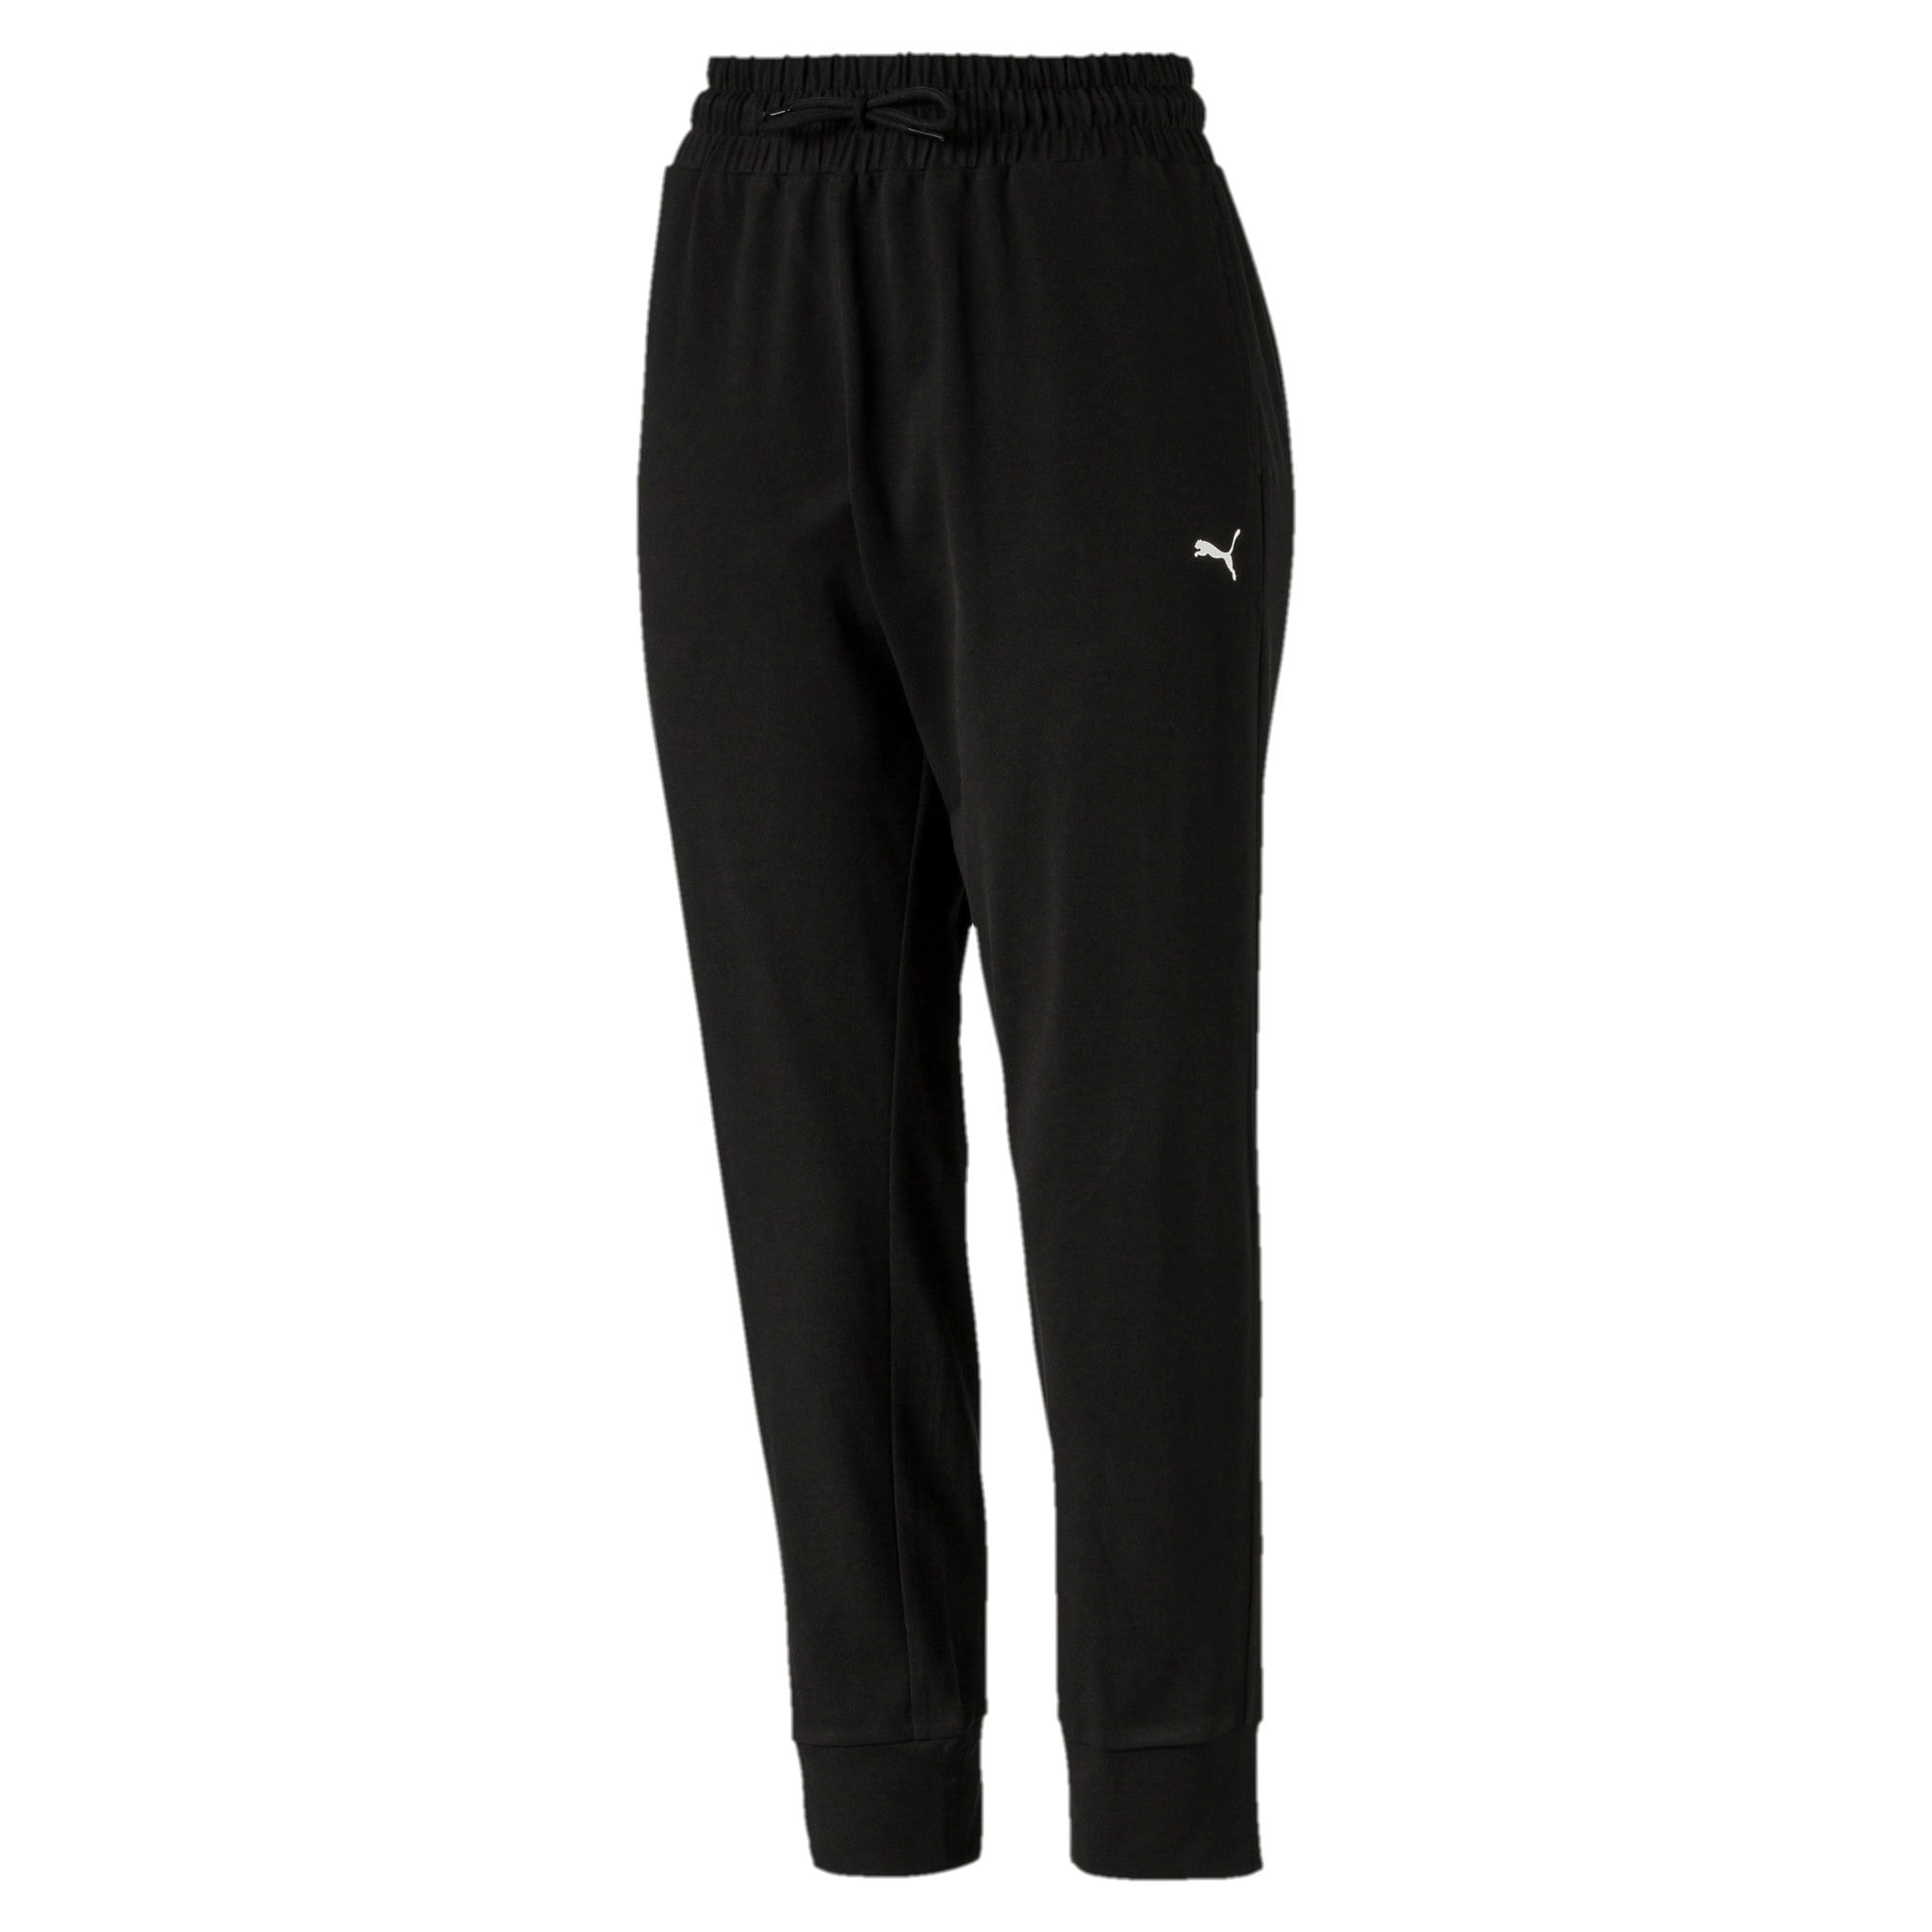 Thumbnail 1 of Women's Summer Pants, Cotton Black, medium